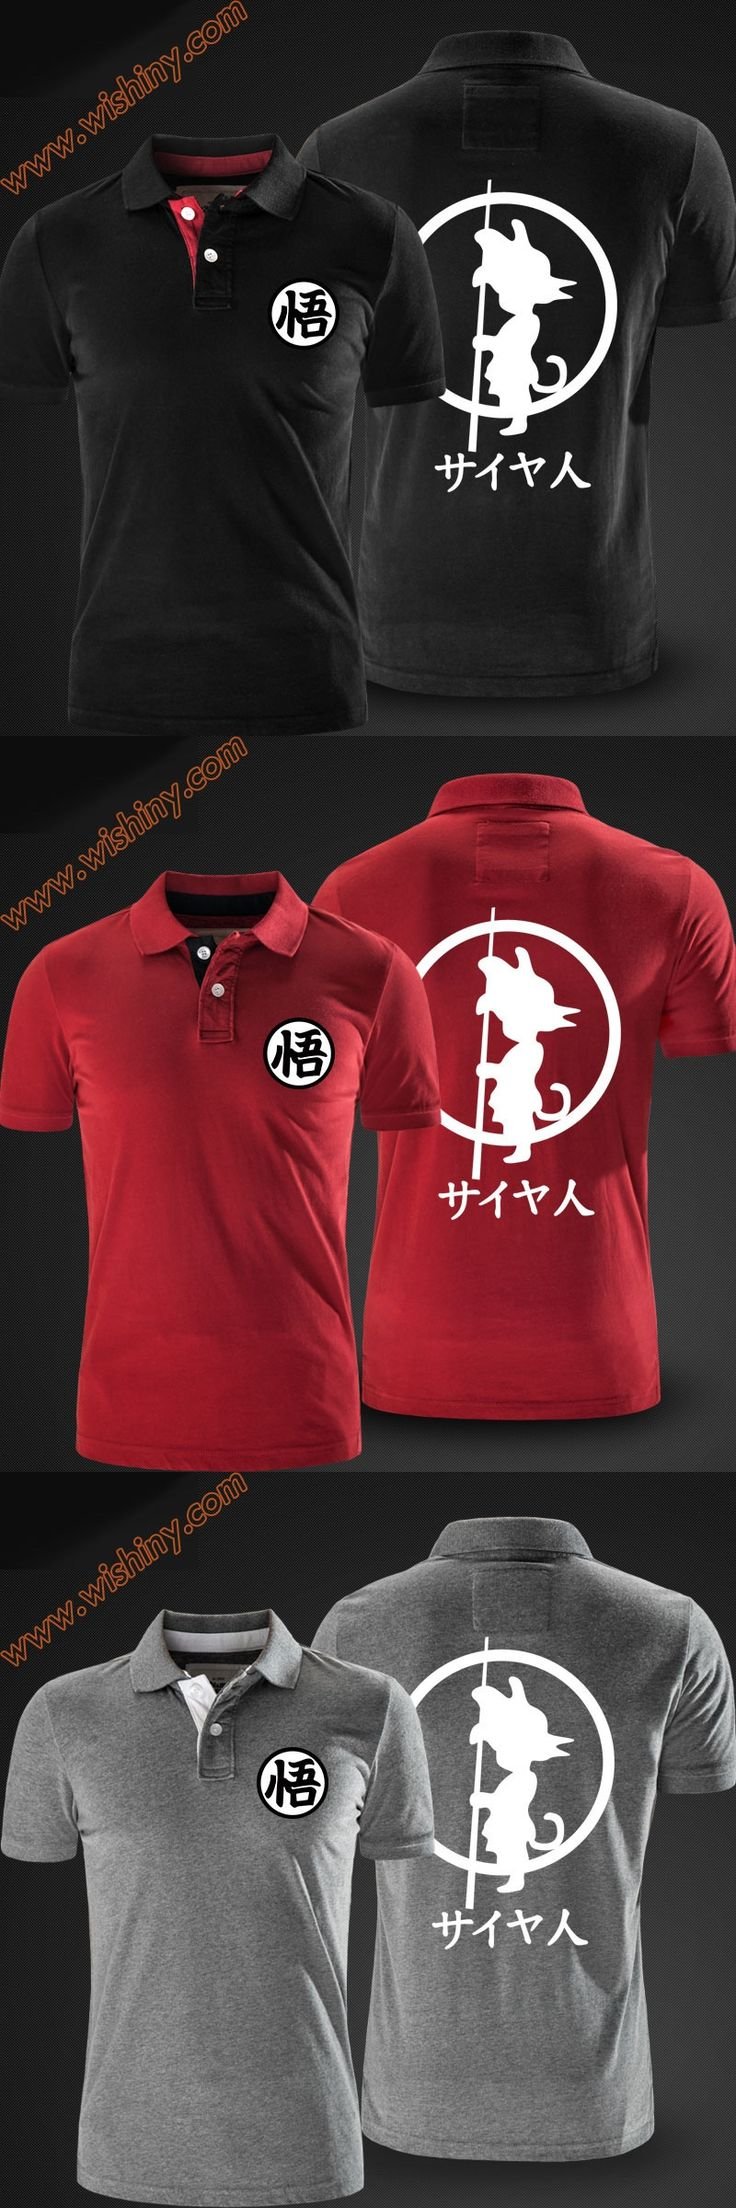 Dragon Ball Kakarotto Polo Shirts Men Short Sleeve DBZ Son Goku Character Tops DB Summer Solid Black Red Grey Polo Cool